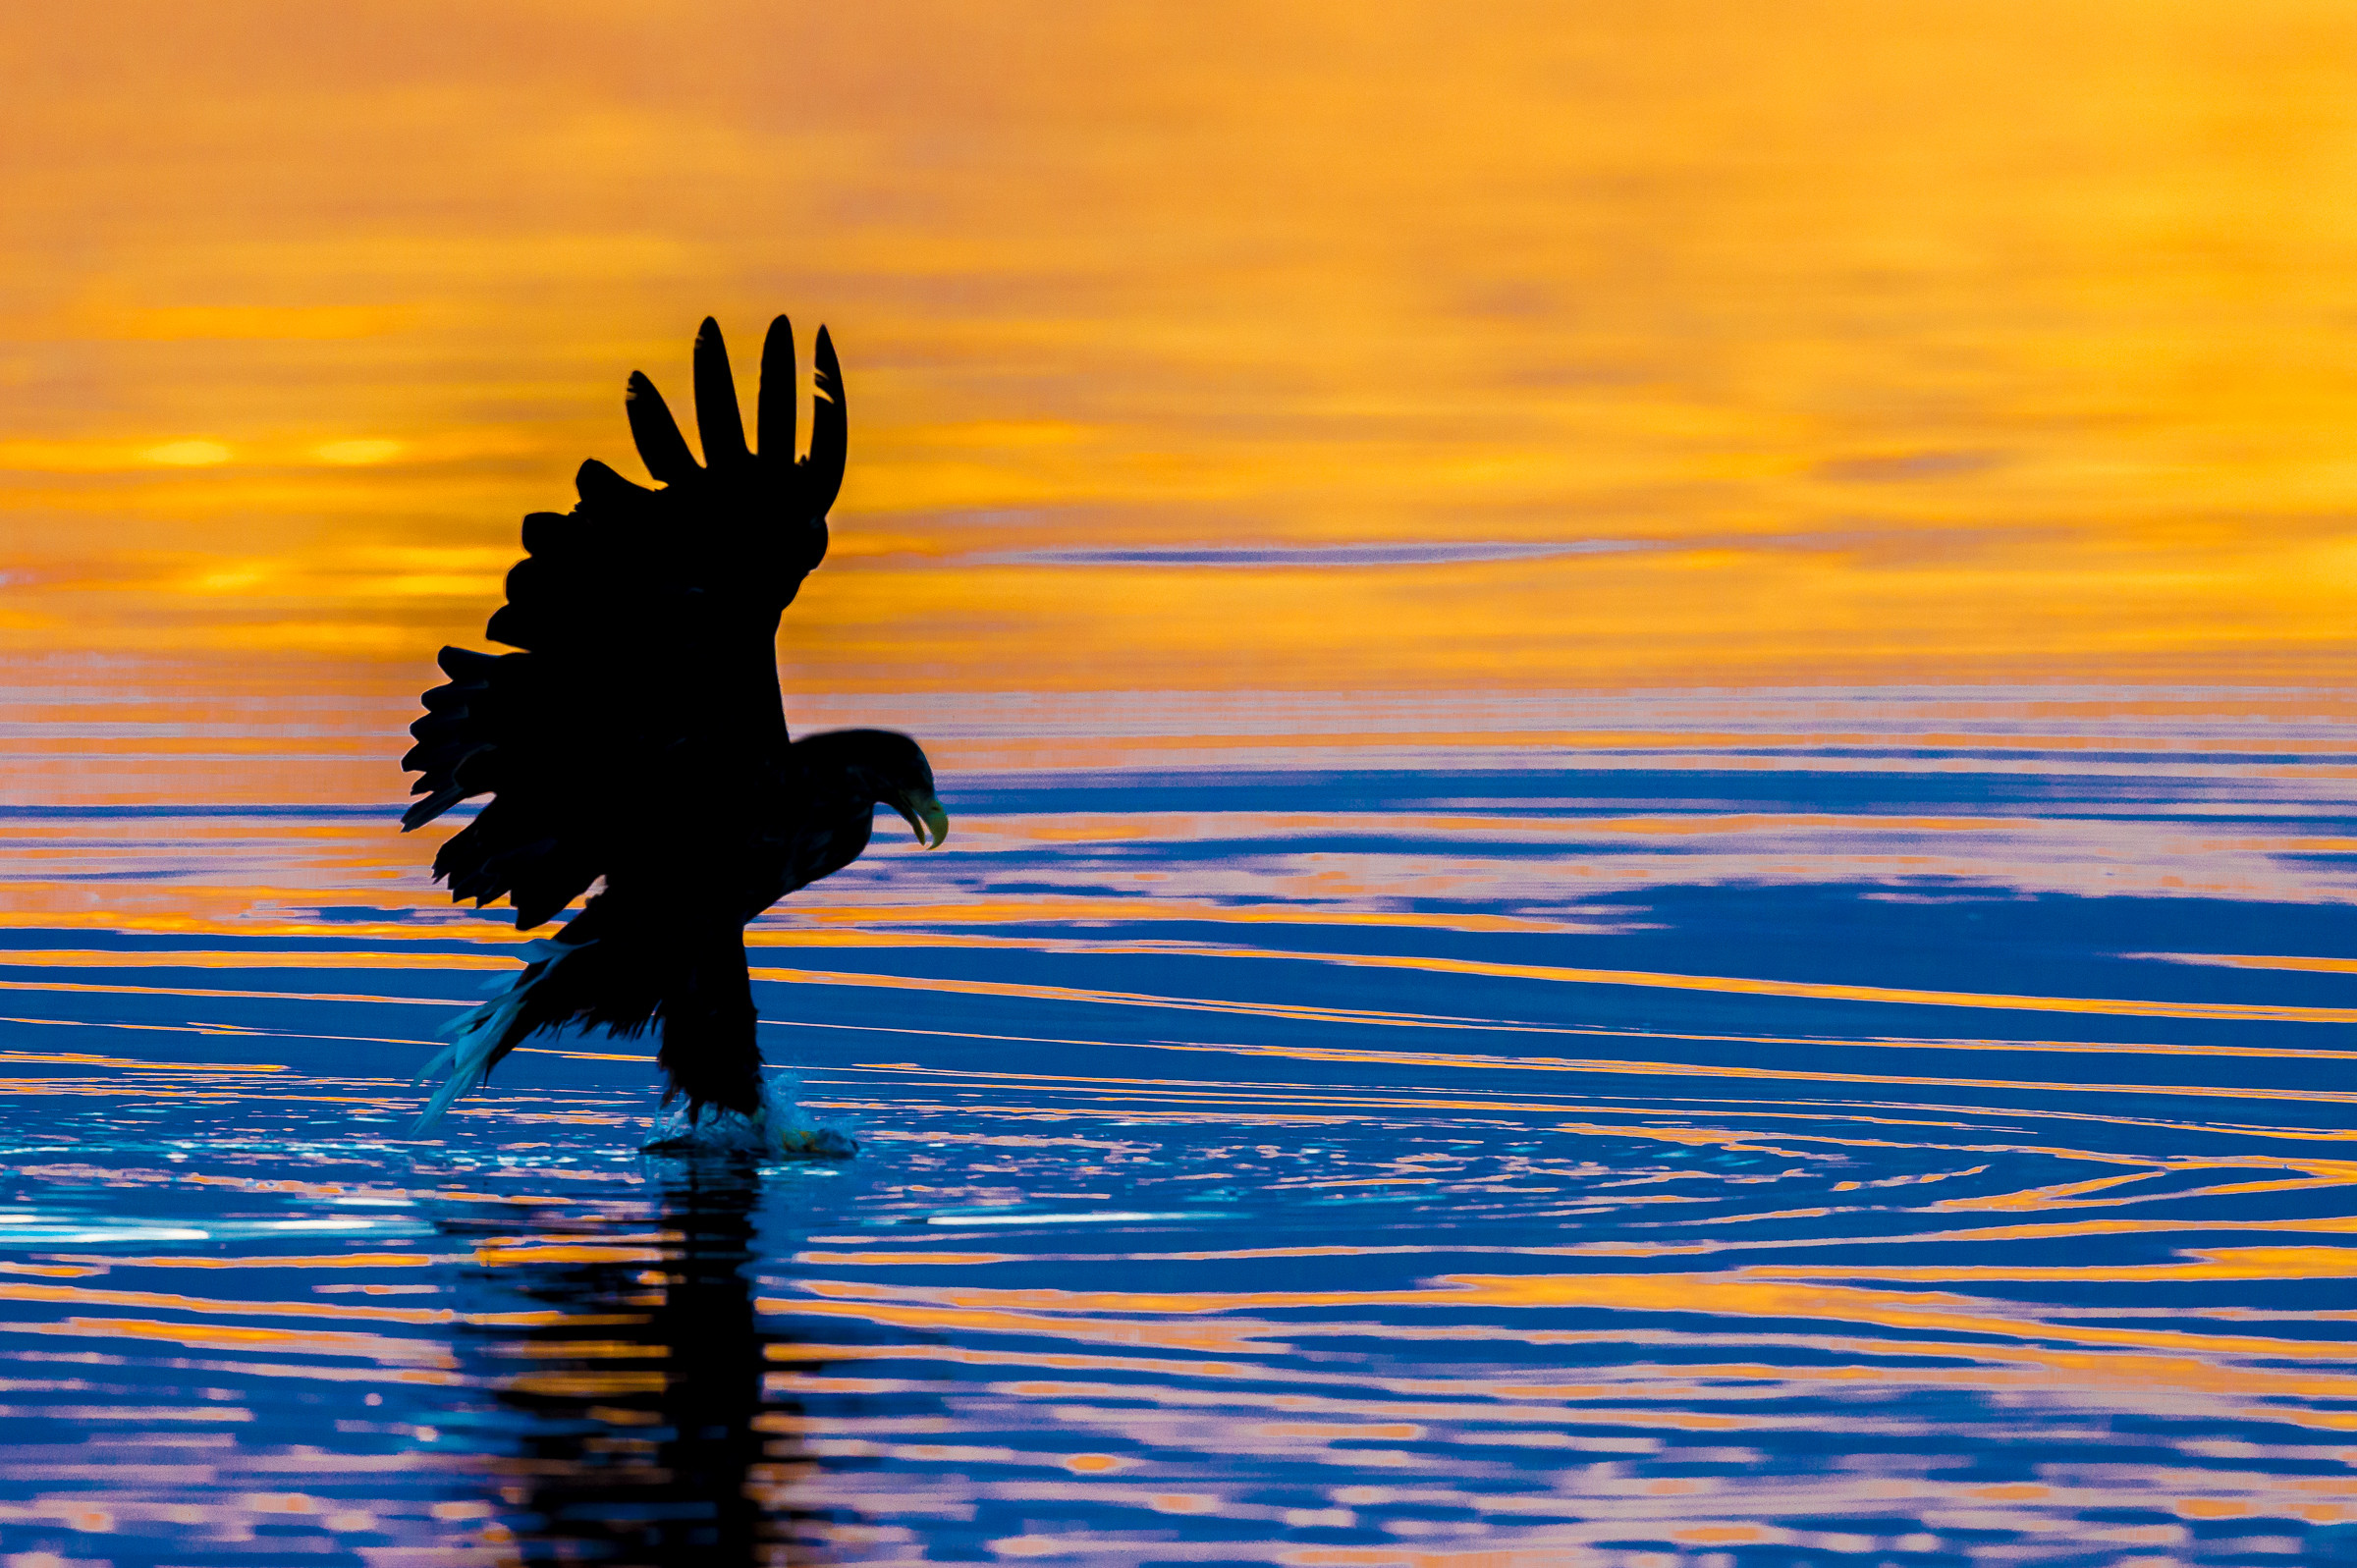 140718Lauvsnes zee arenden14-07-sea eagles-_D4S7210.jpg